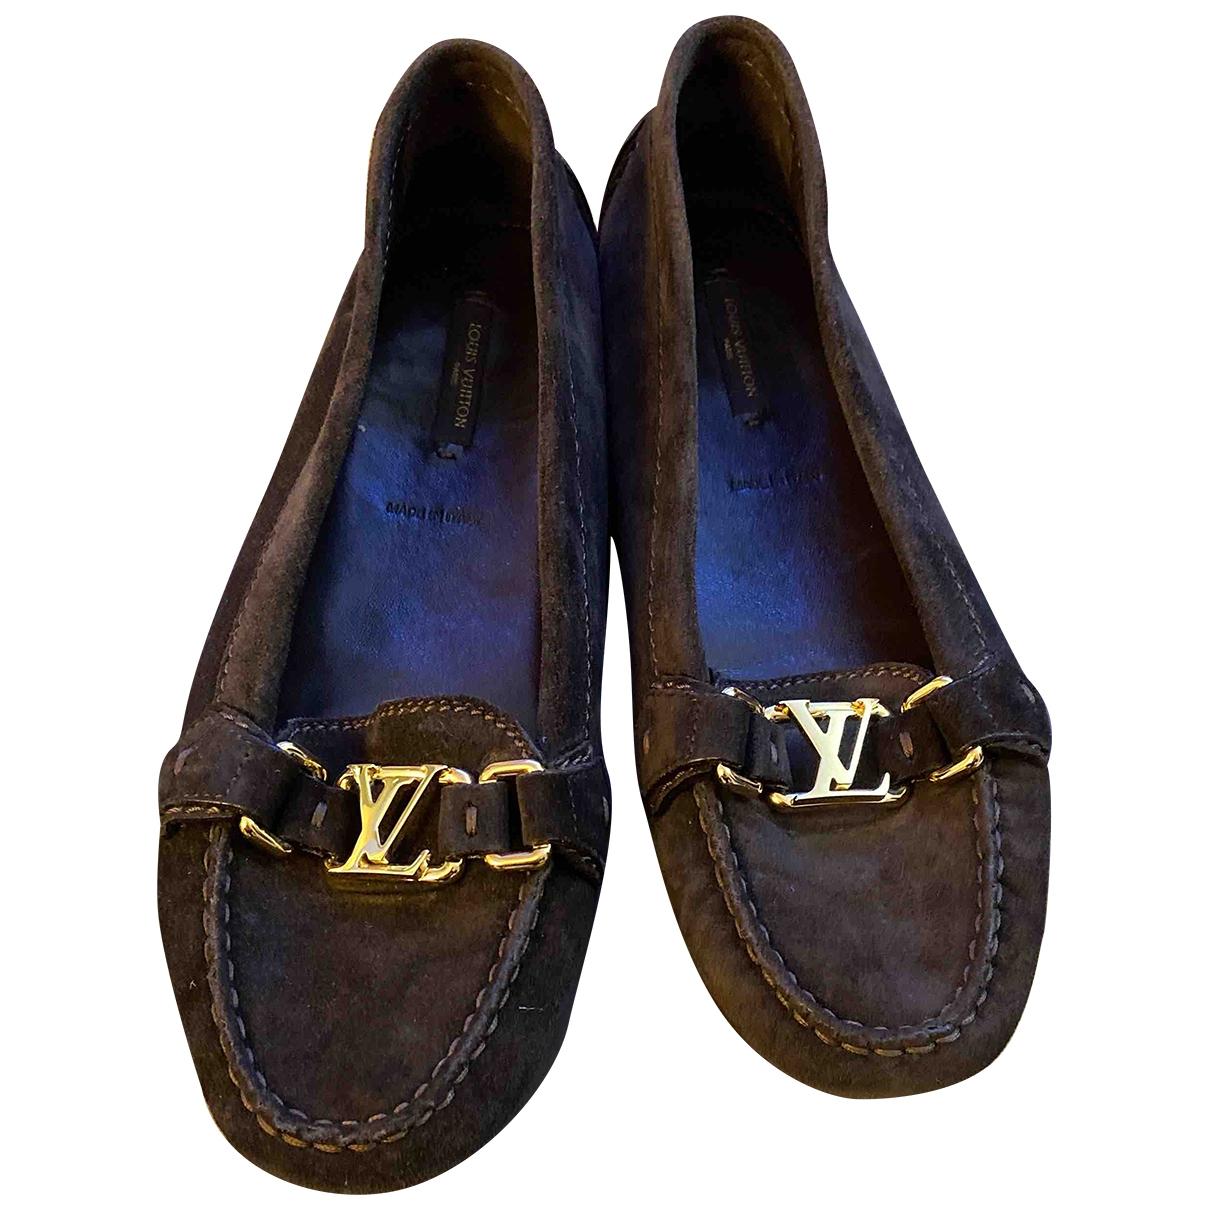 Mocasines de Terciopelo Louis Vuitton